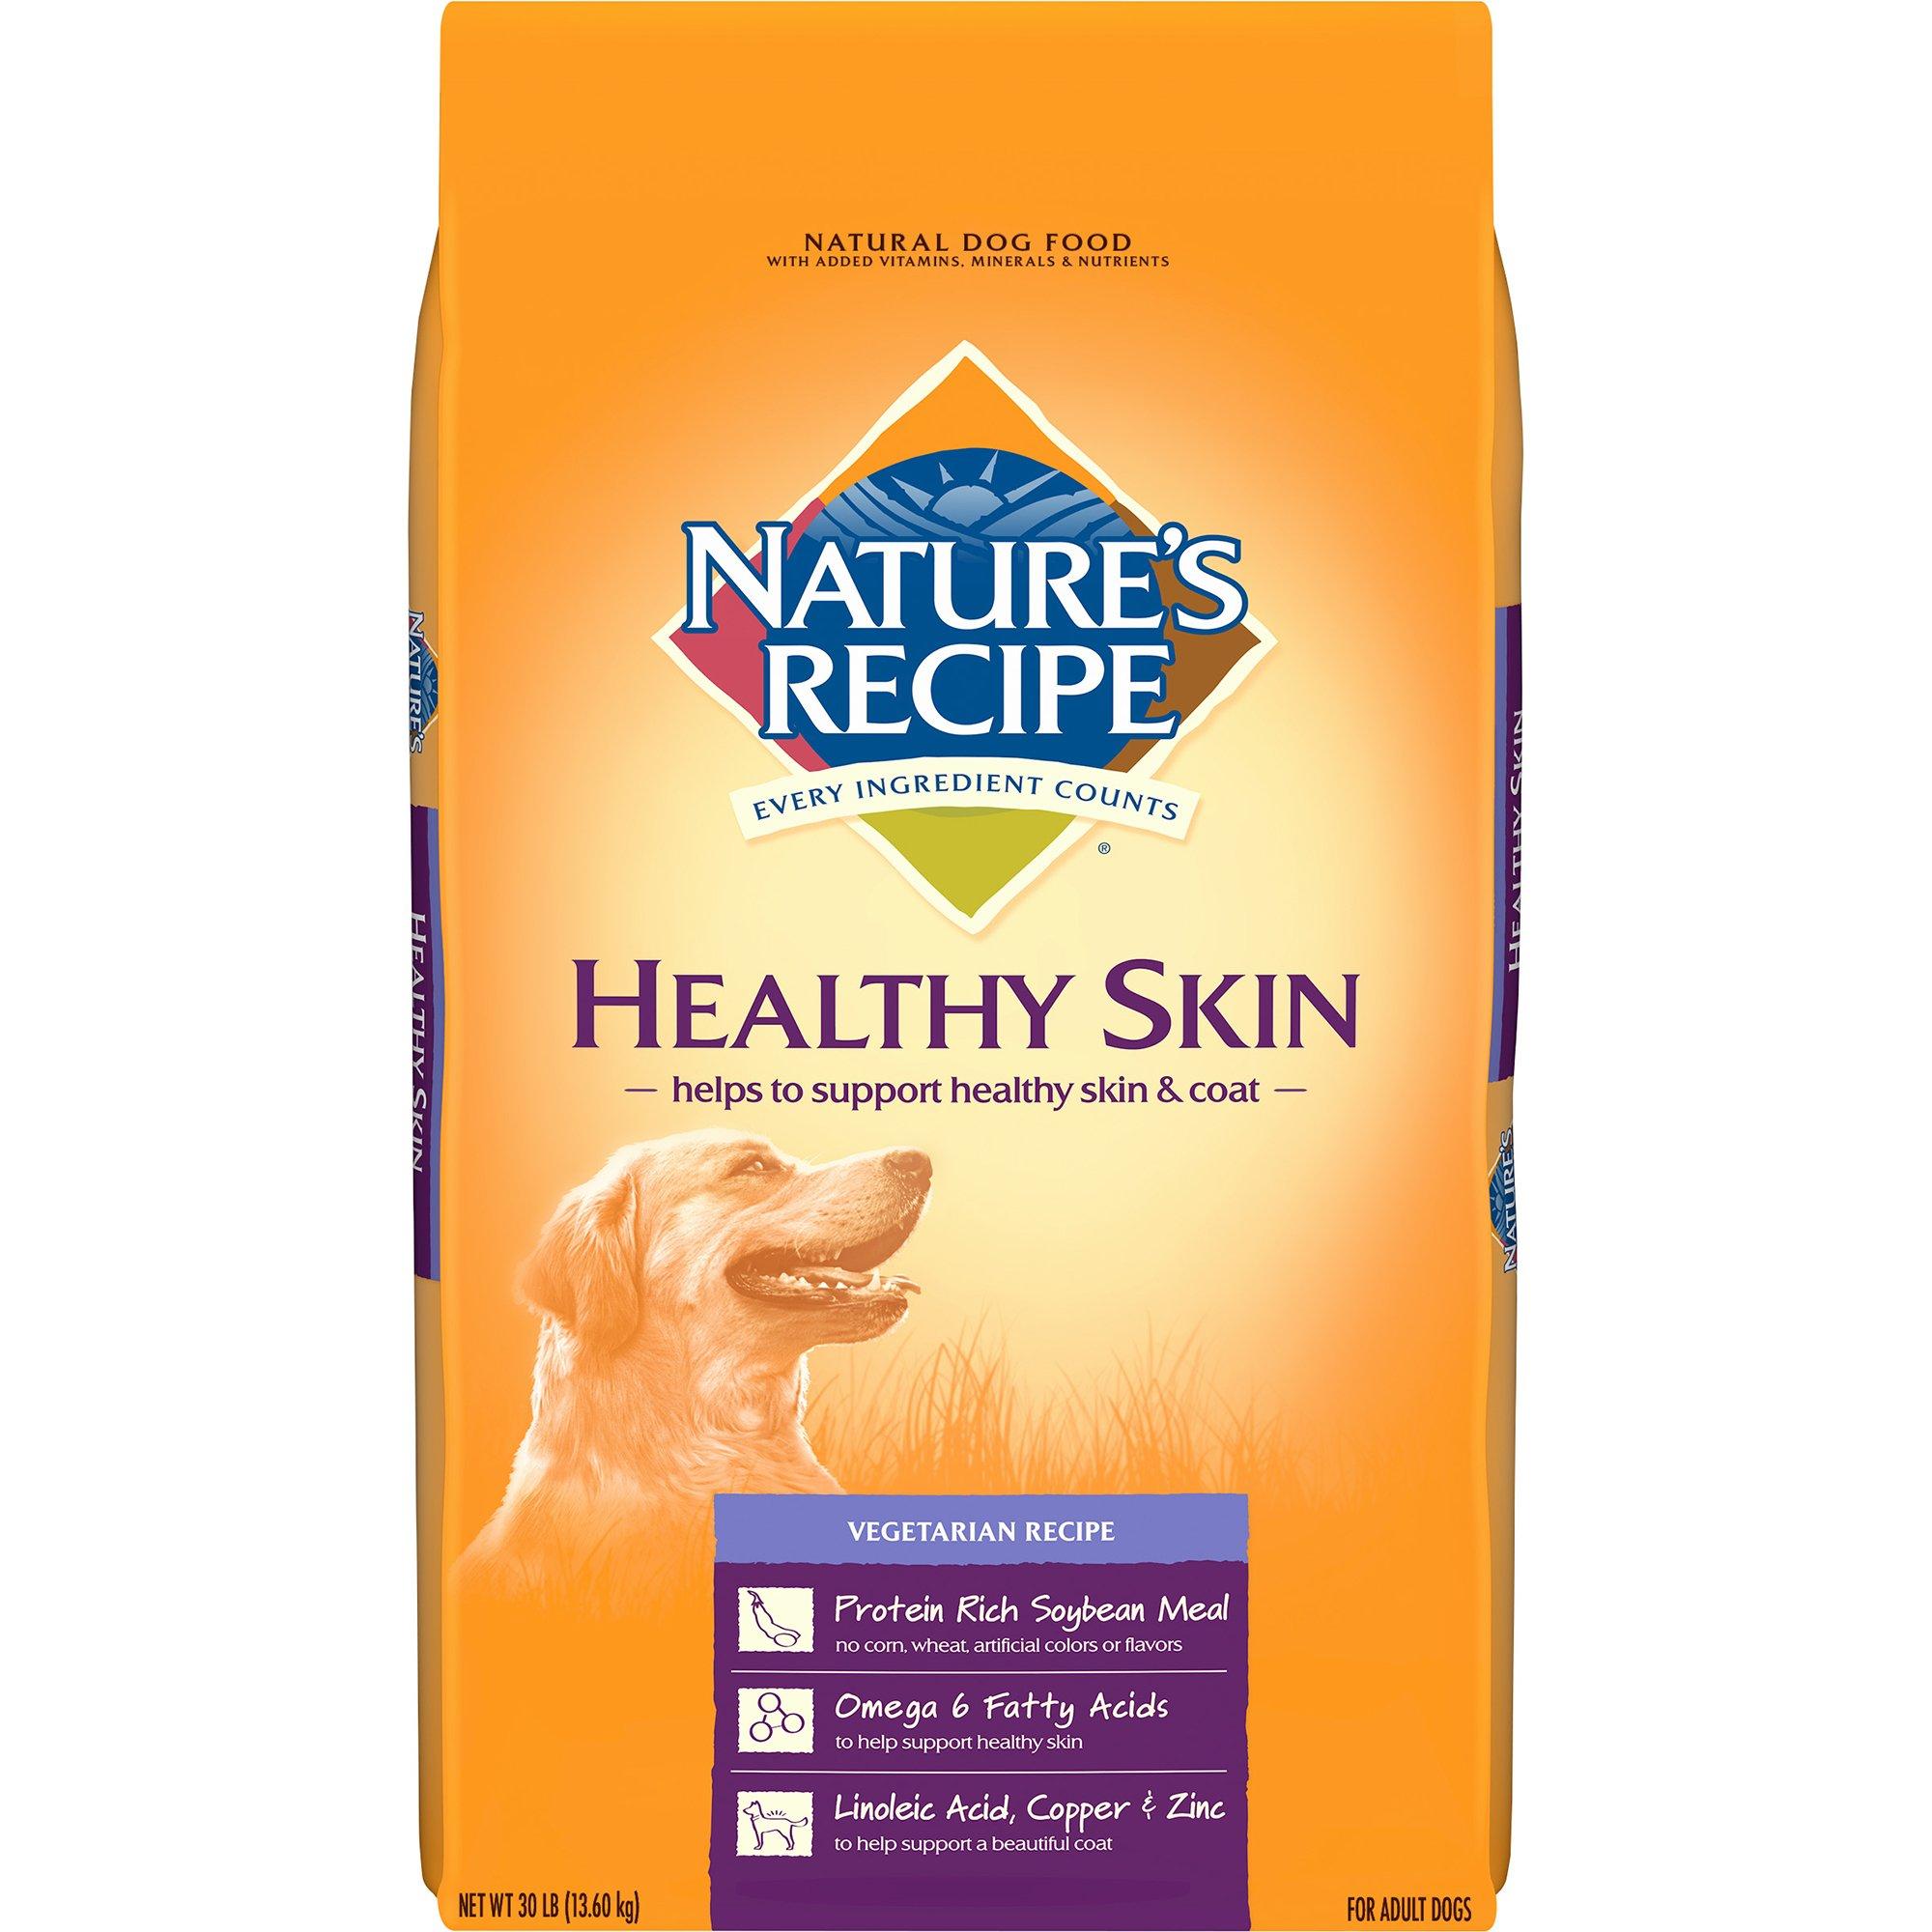 Natures Recipe Dog Food Reviews